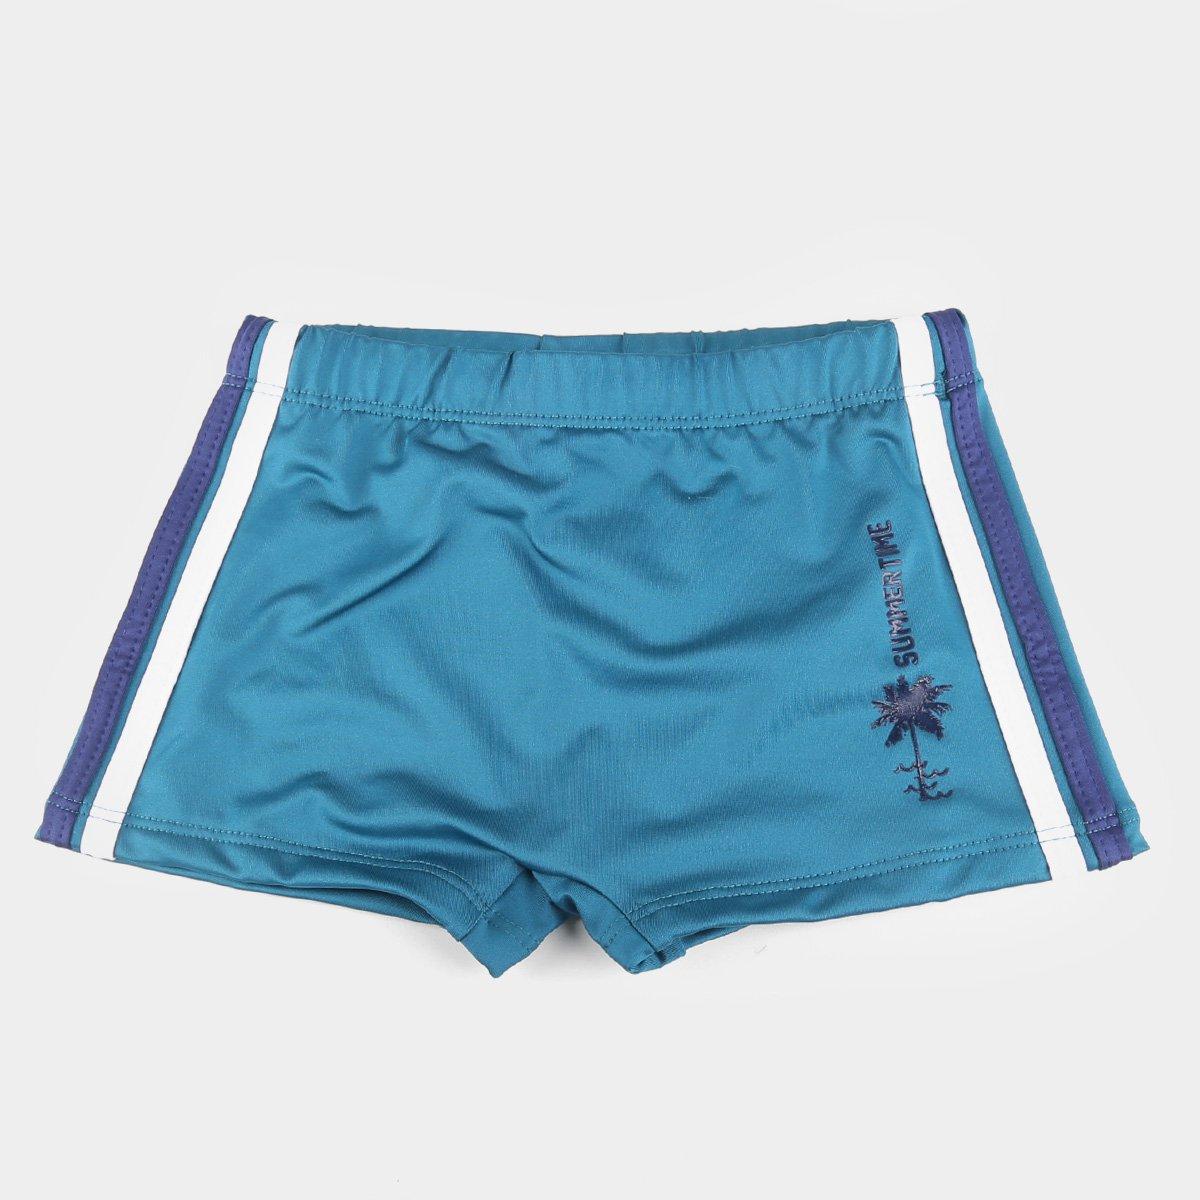 Sunga Infantil Hering Proteção UV 50+ Boxer